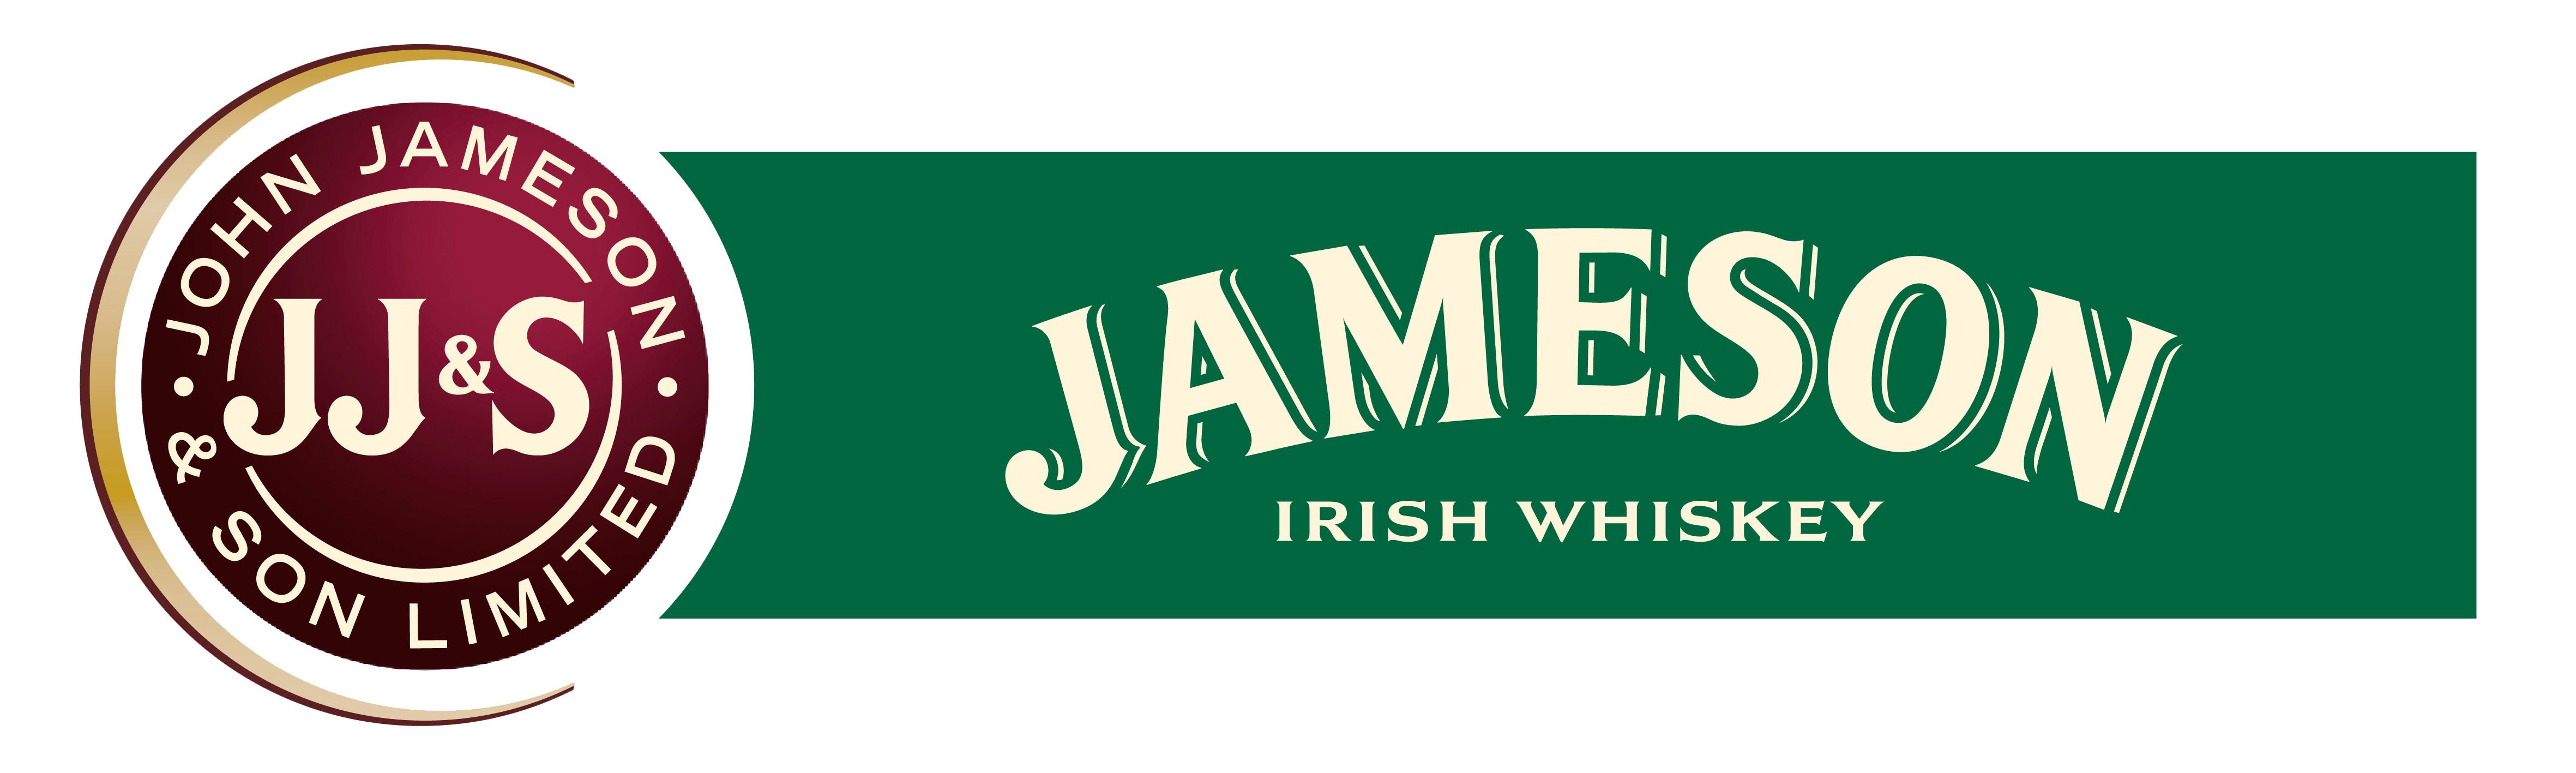 jameson_logo